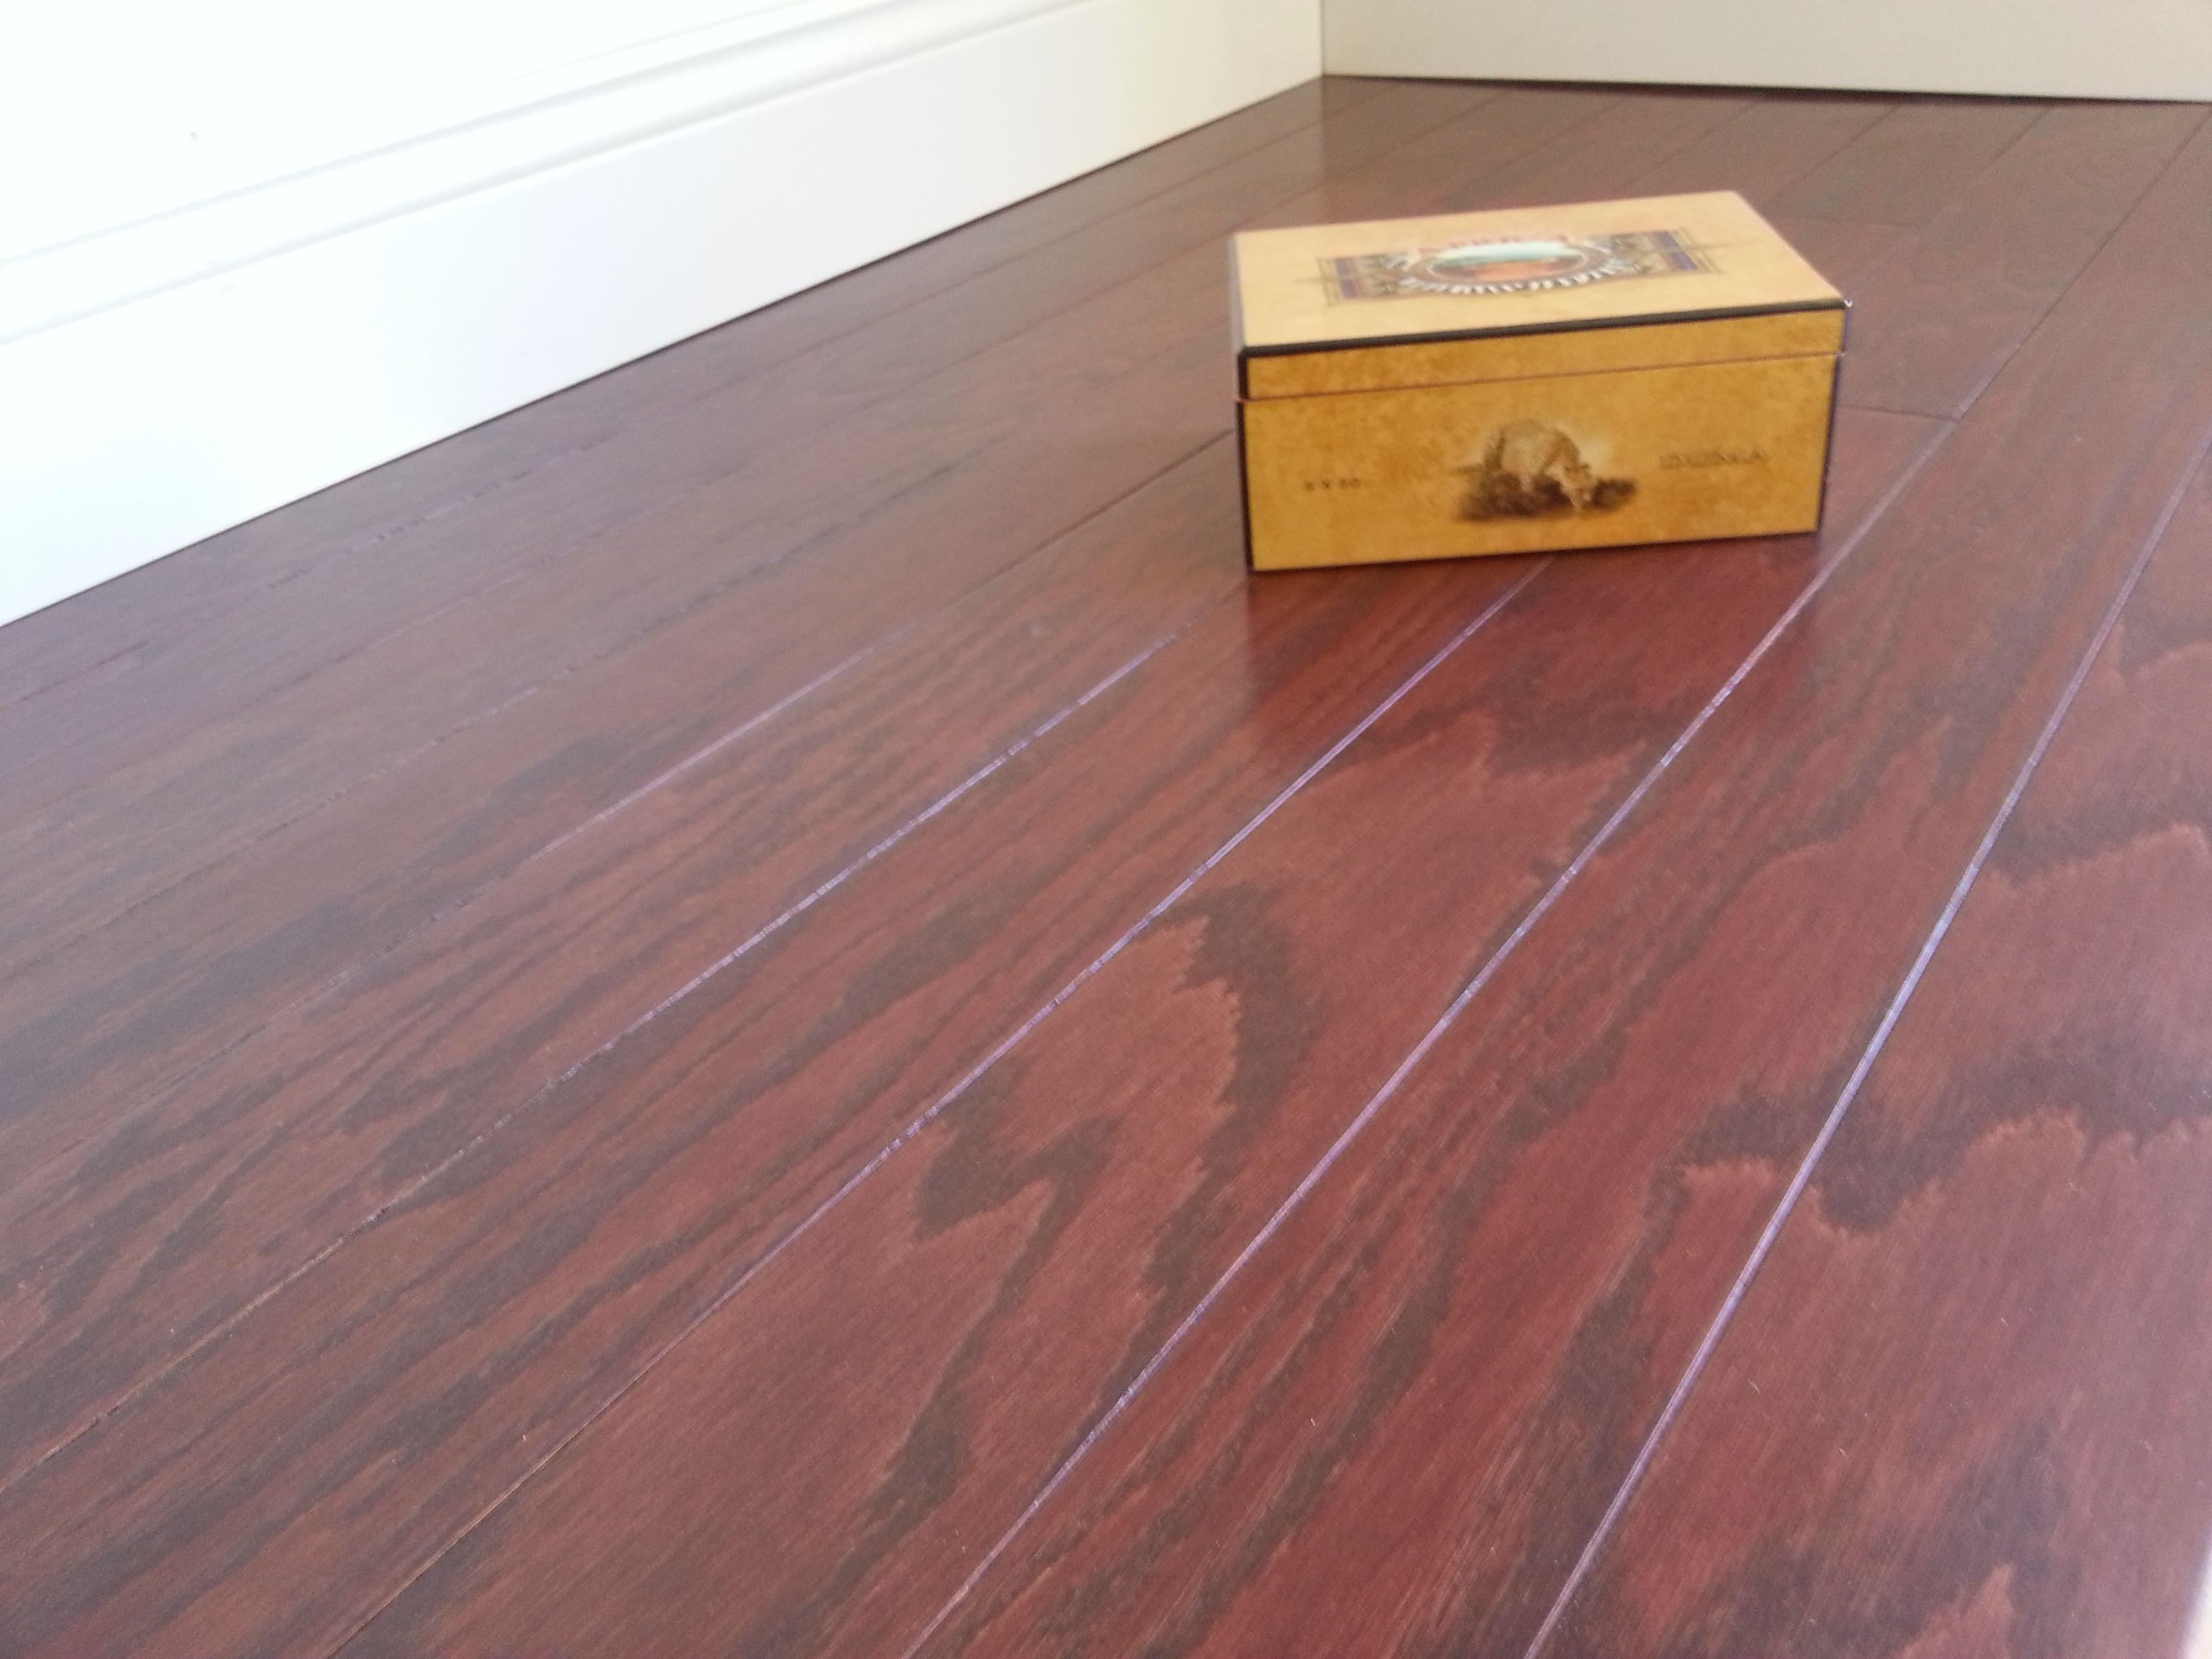 red oak hardwood flooring for sale of 3 1 4 symphonic engineered oak merlot hardwood flooring as low as within 3 1 4 symphonic engineered oak merlot hardwood flooring as low as 3 23 sf